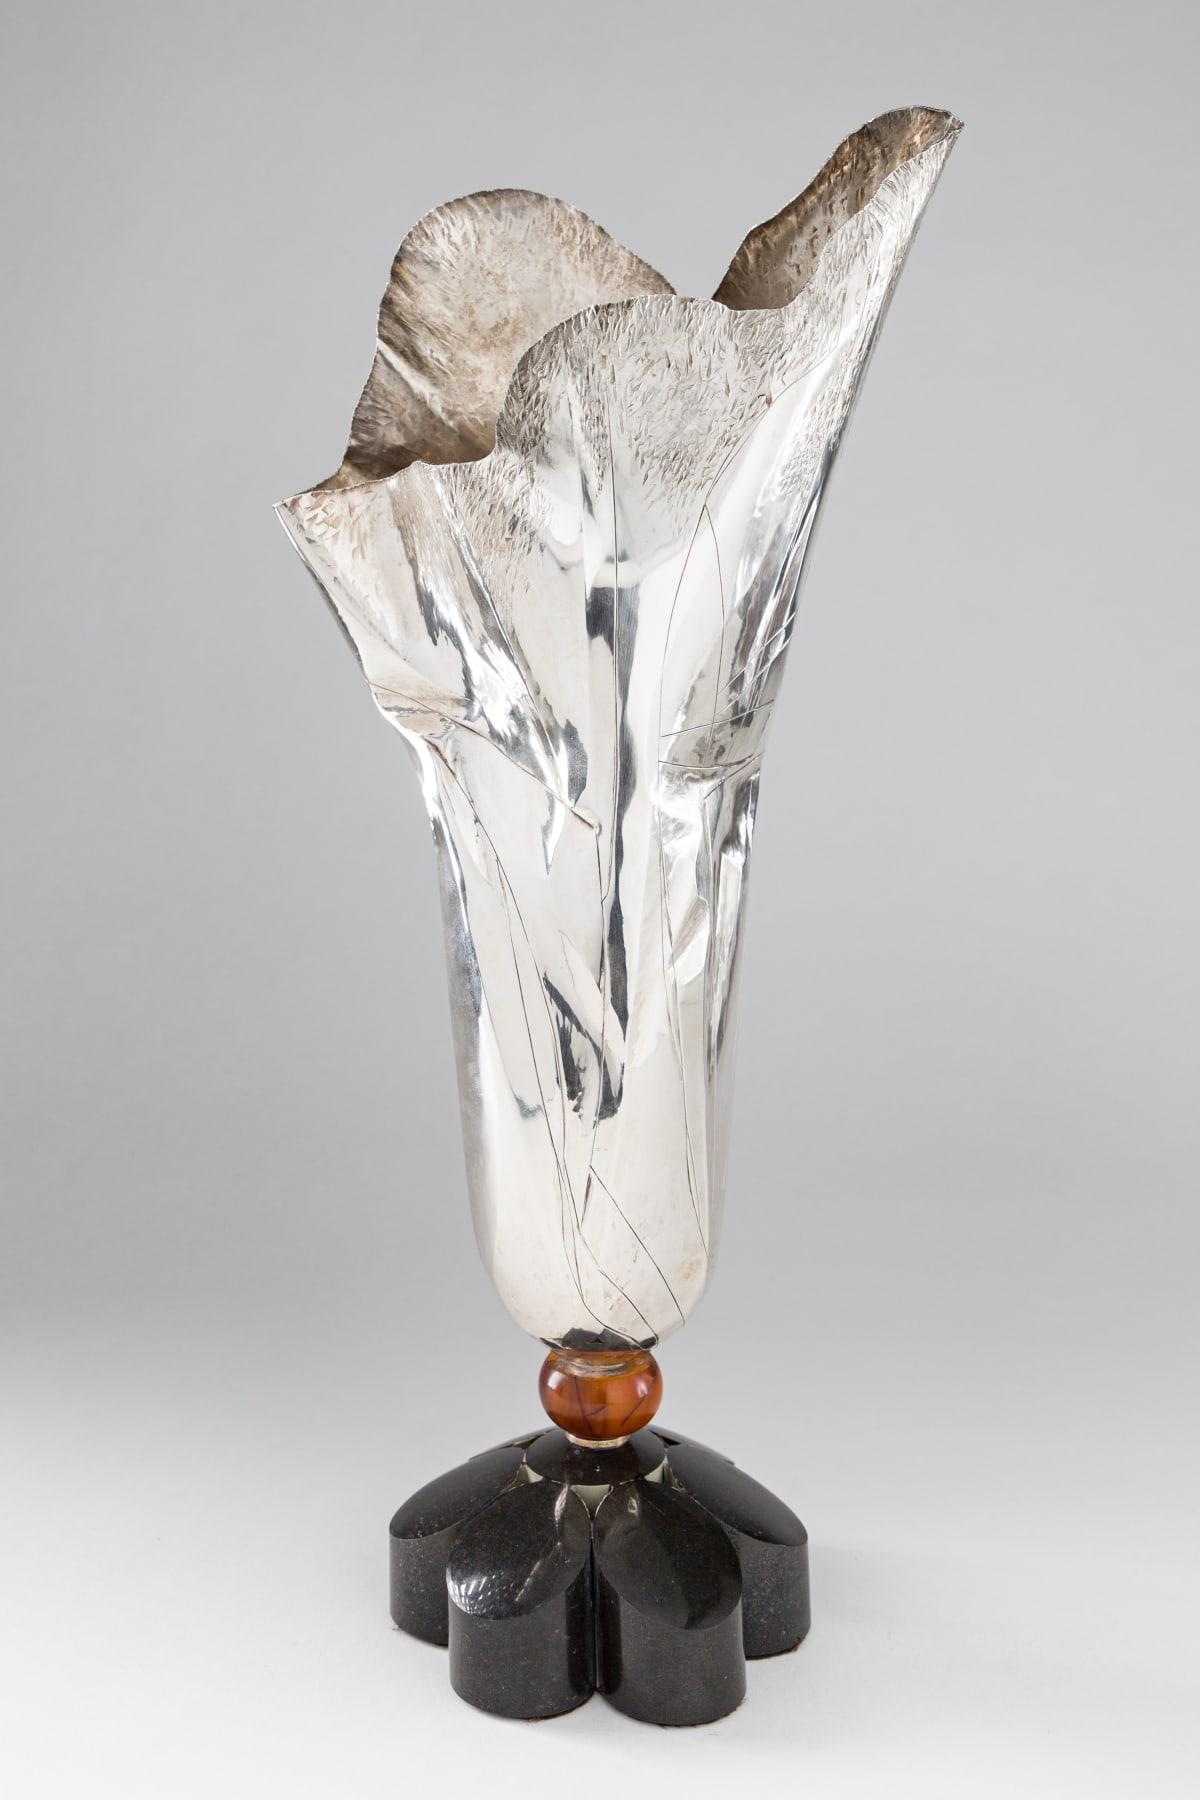 John Marshall, Vase, 1990